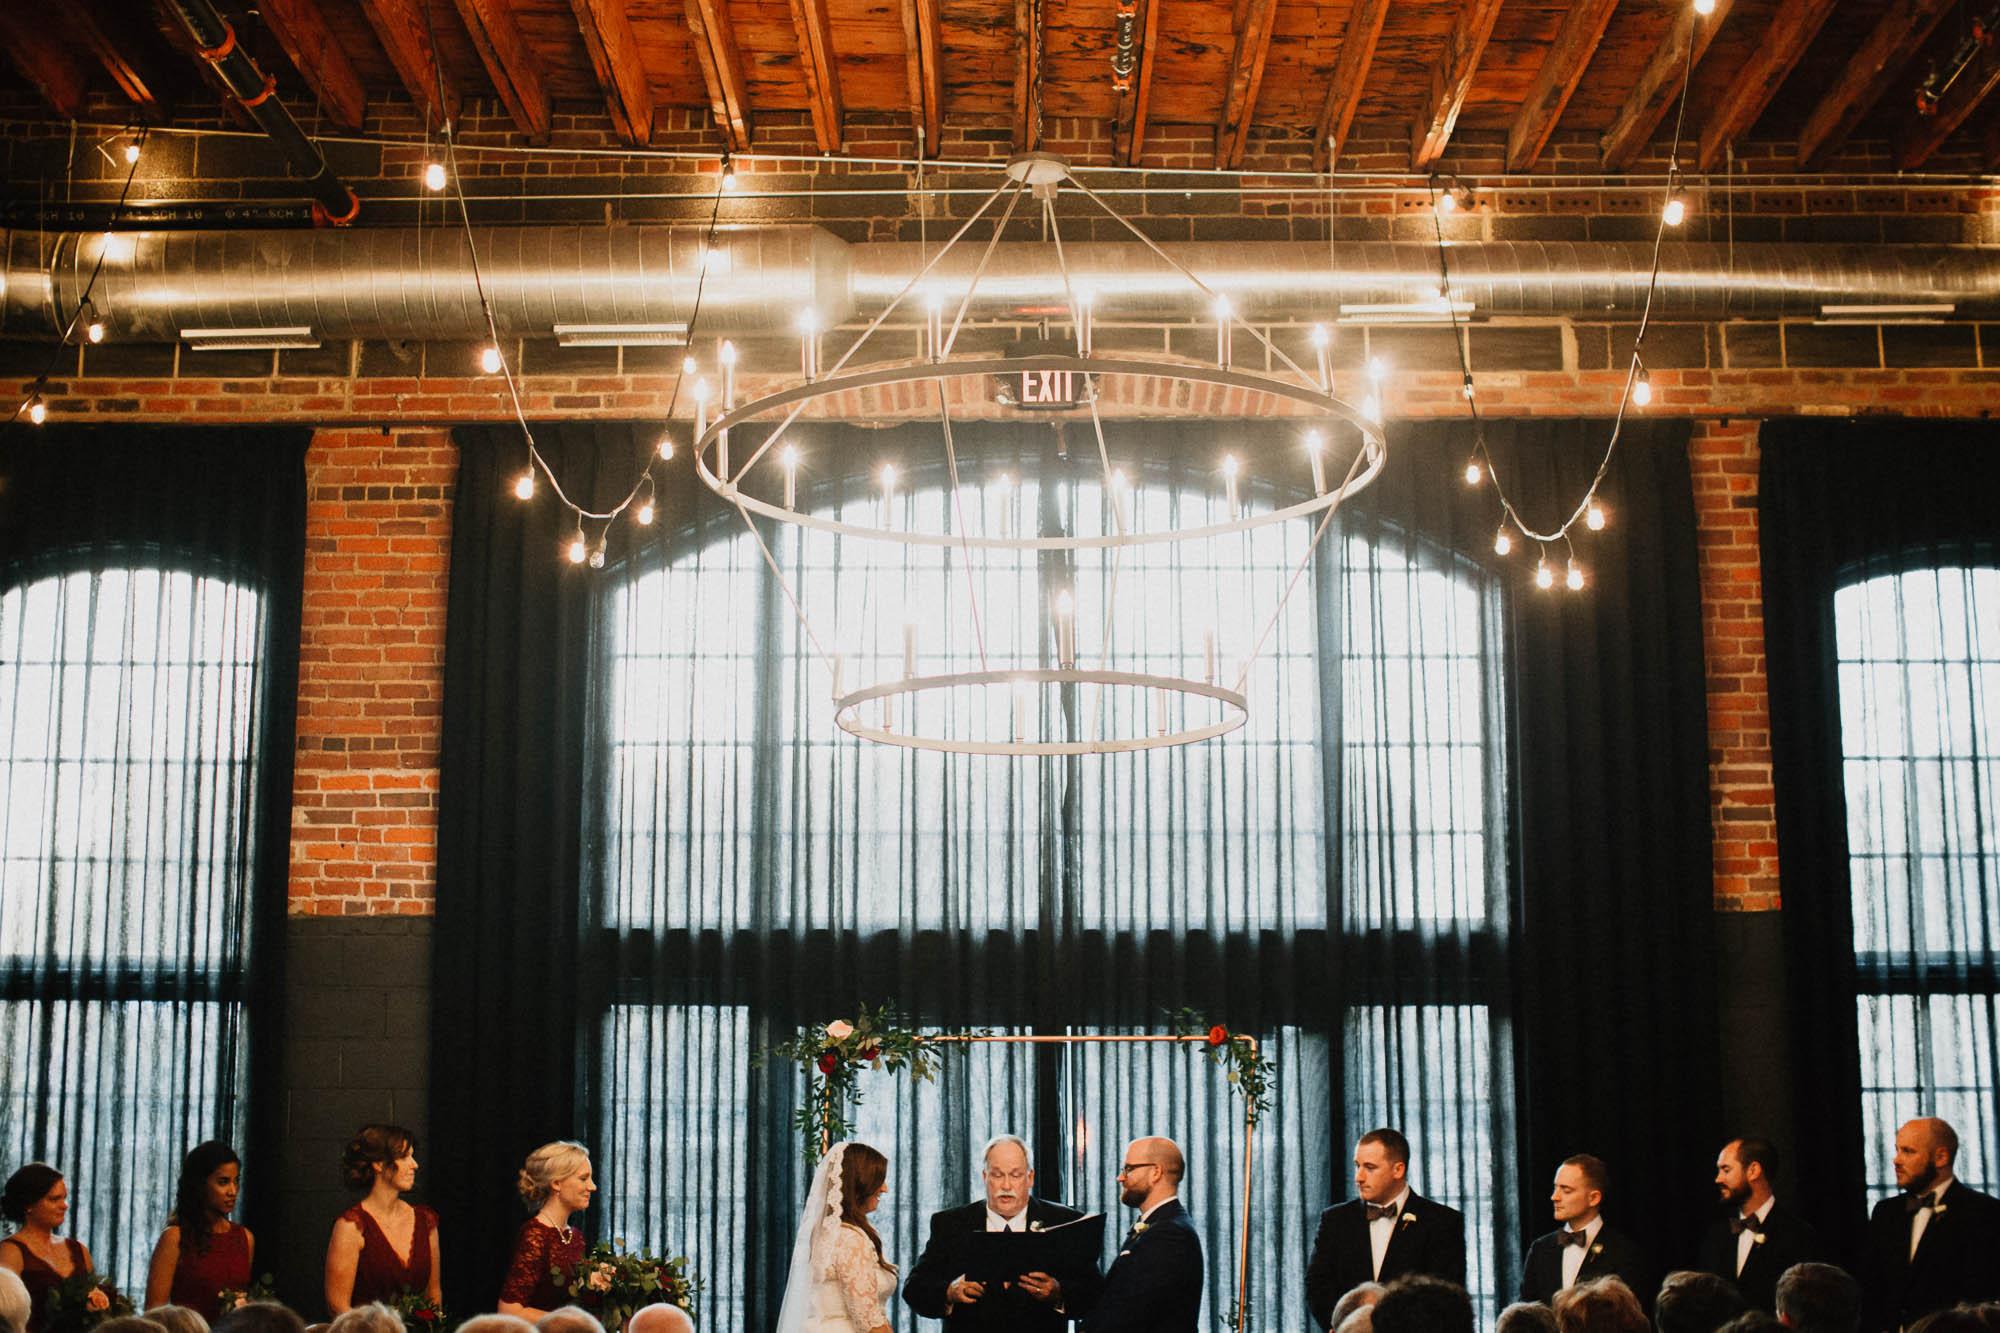 Highline-Car-House-Wedding-Columbus-Kristin-Aaron-079.jpg